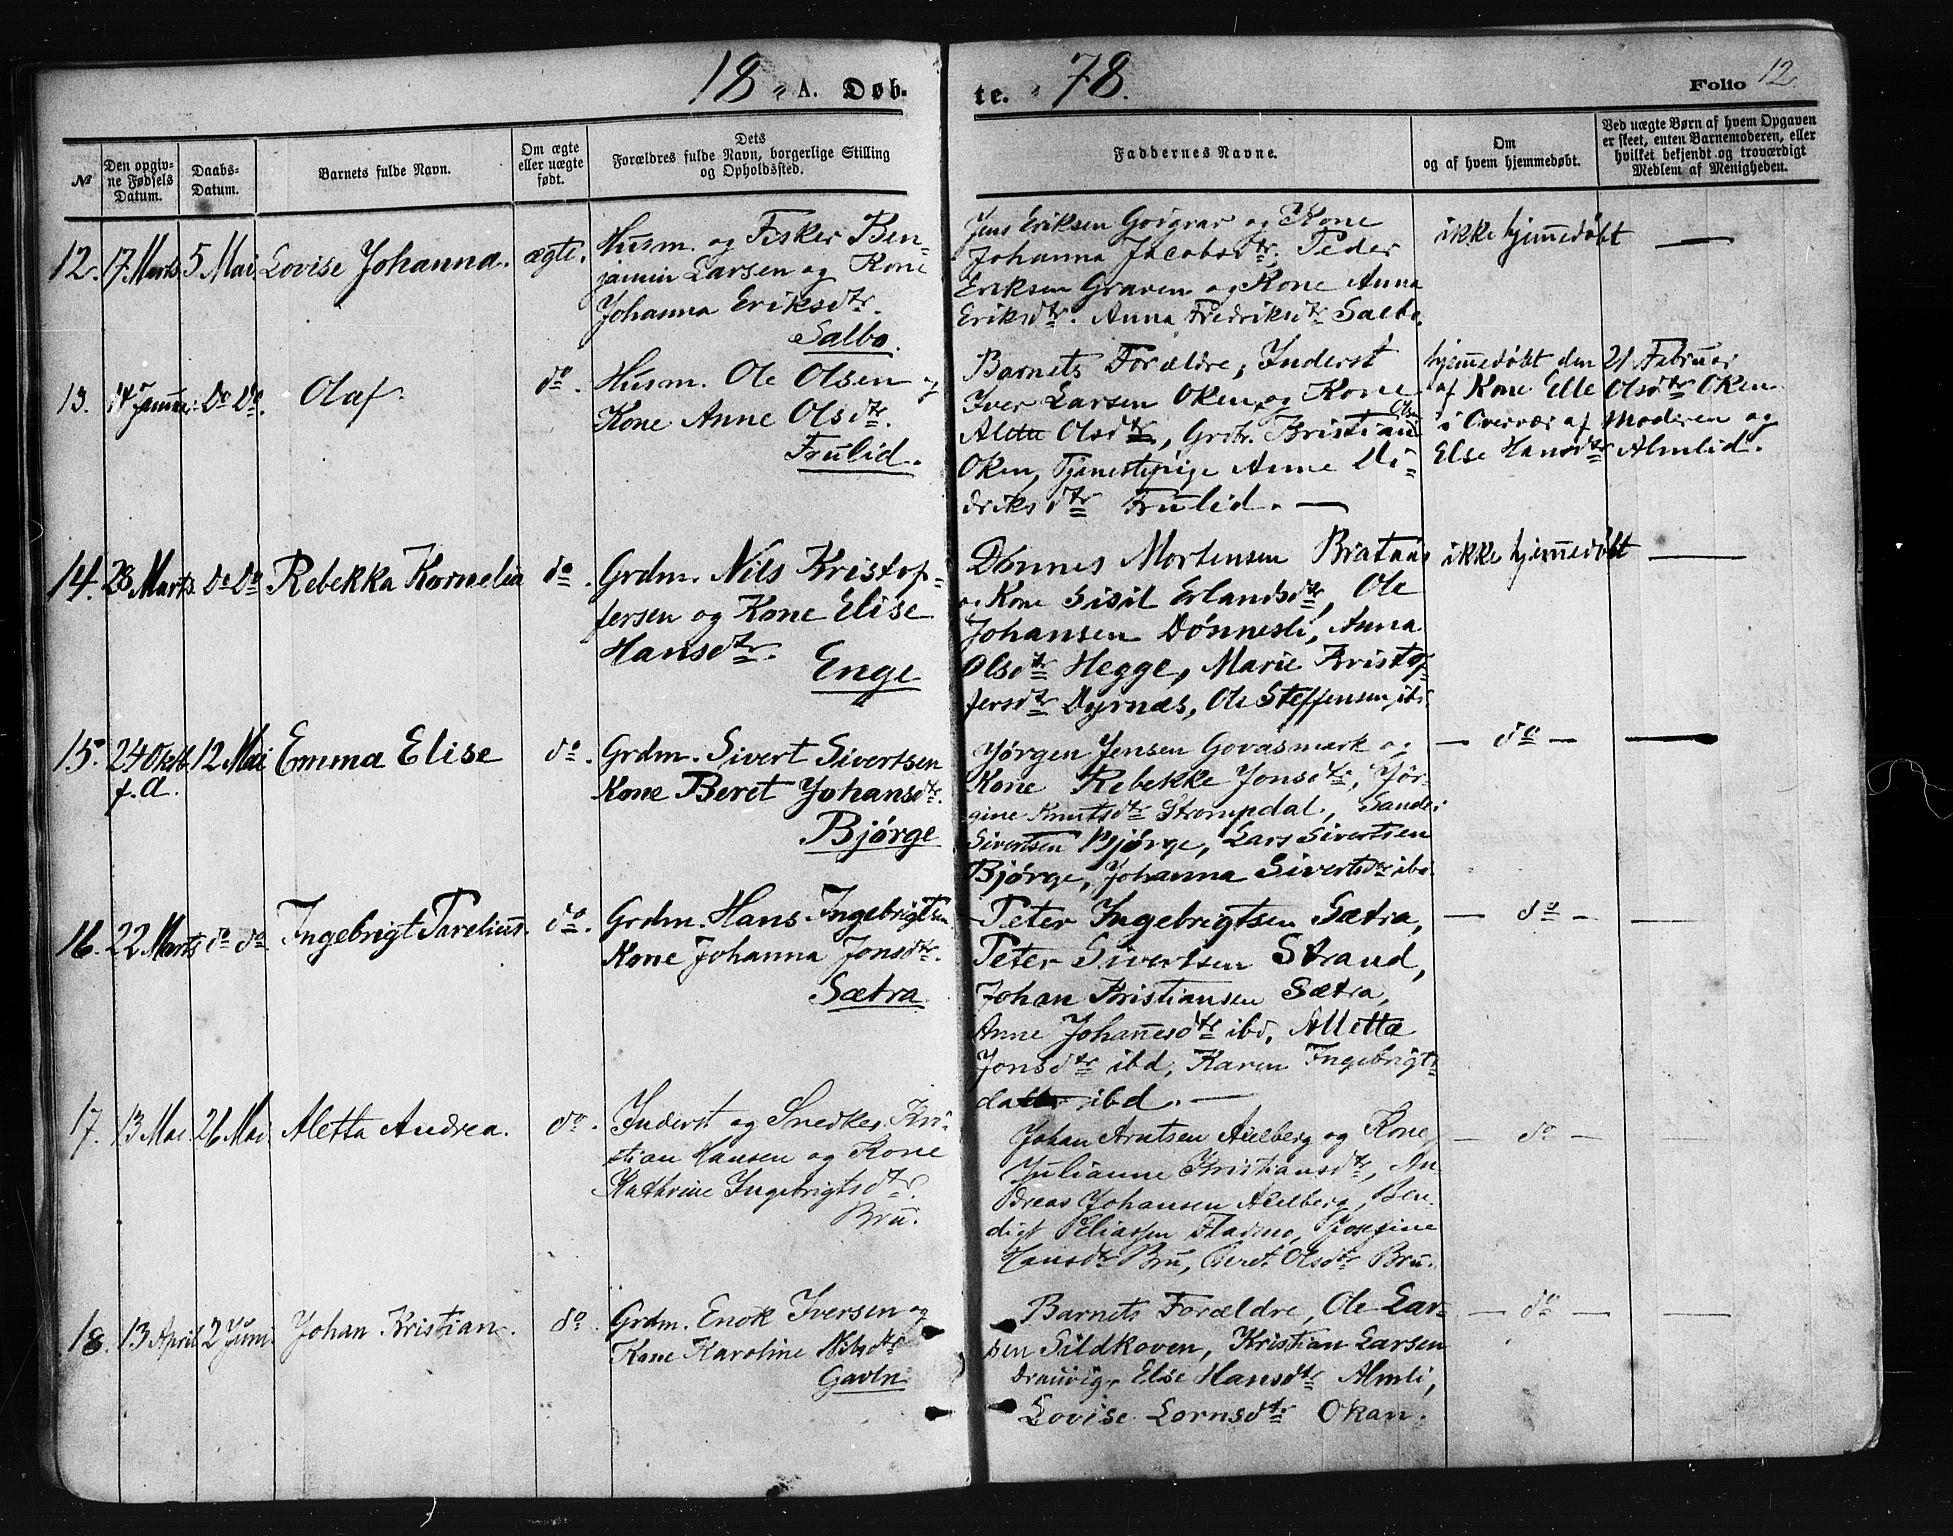 SAT, Ministerialprotokoller, klokkerbøker og fødselsregistre - Nordland, 814/L0225: Ministerialbok nr. 814A06, 1875-1885, s. 12